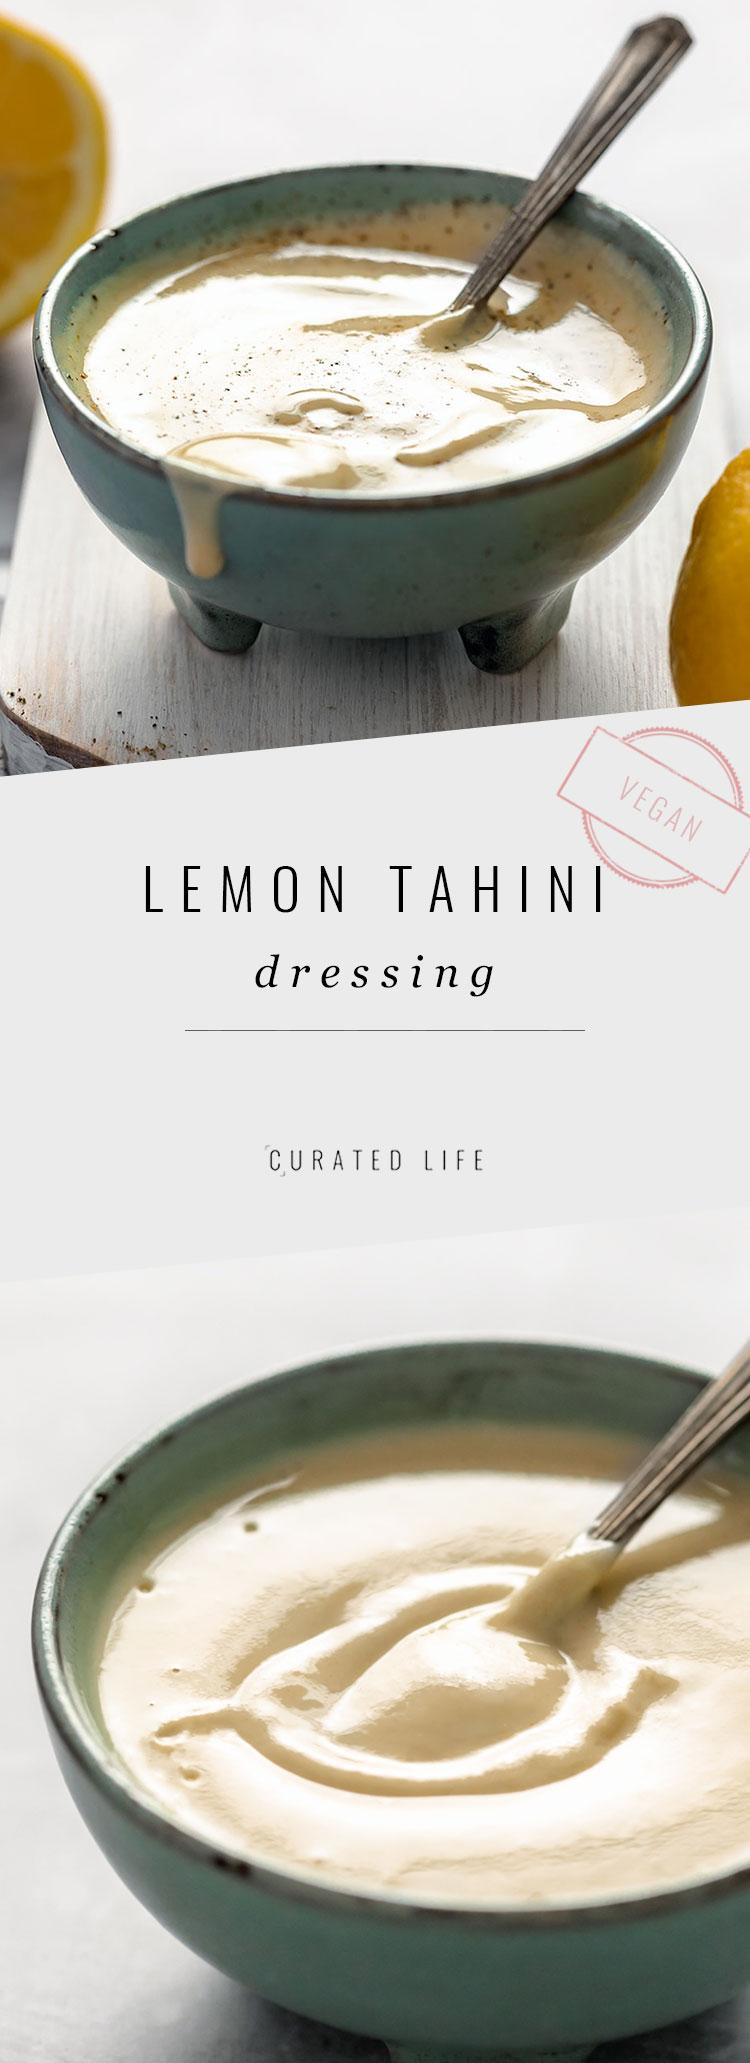 Not only is this Lemon Tahini Dressing recipe vegan and dairy-free, it's delicious making it perfect for falafels, roast veggies or your favourite burger!   #curatedlifestudio #tahini #dressing #lemon #vegan #healthy #easy